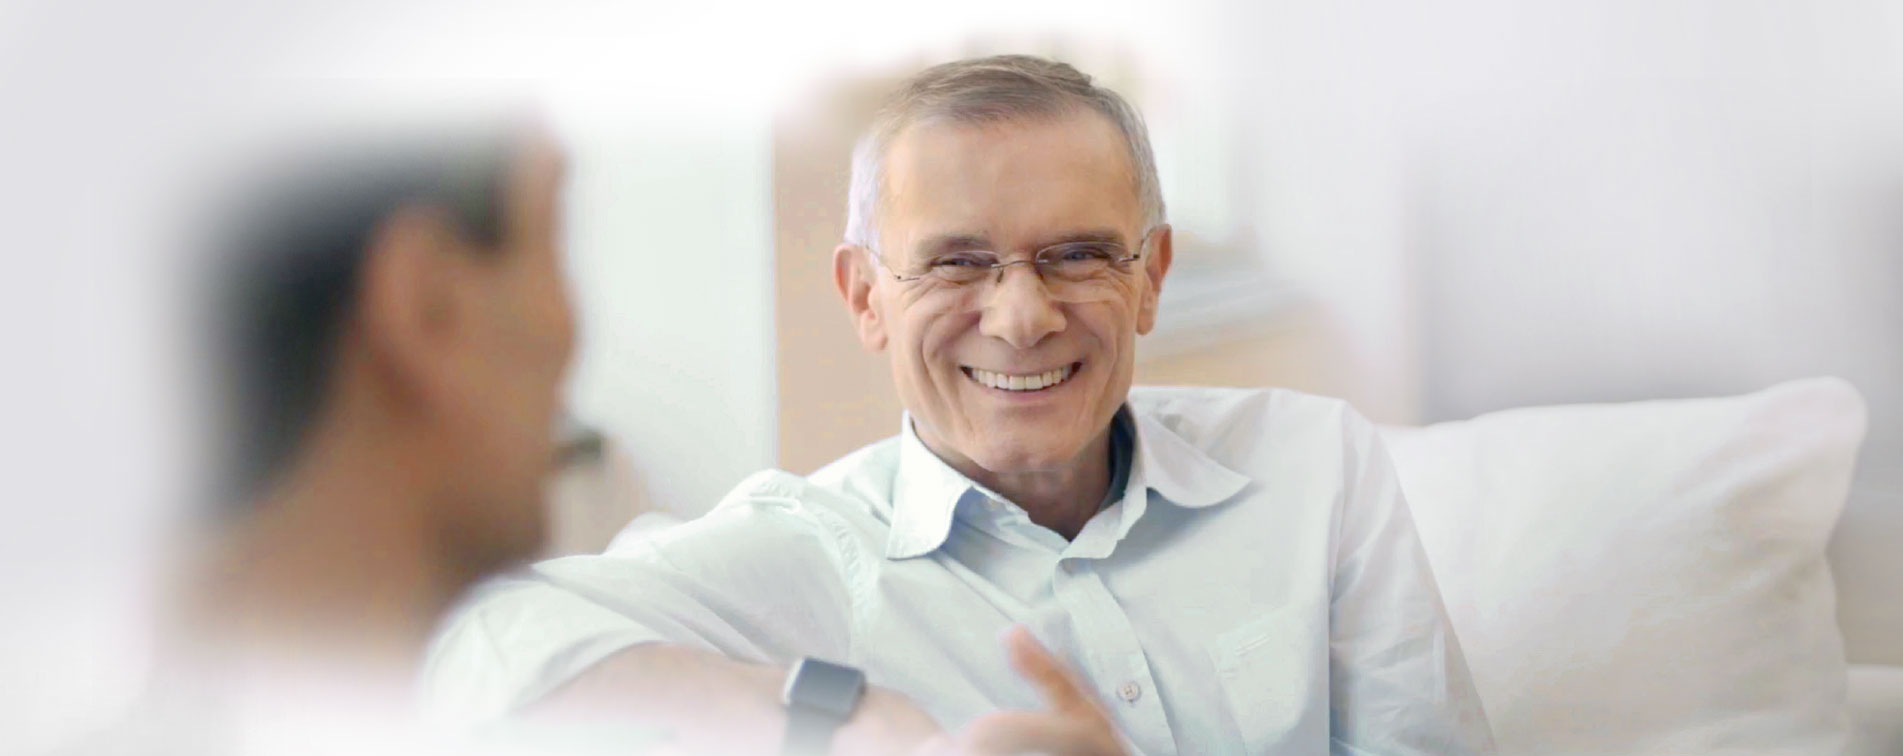 institut-fuer-kognitives-management-stuttgart-milenko-vlajkov